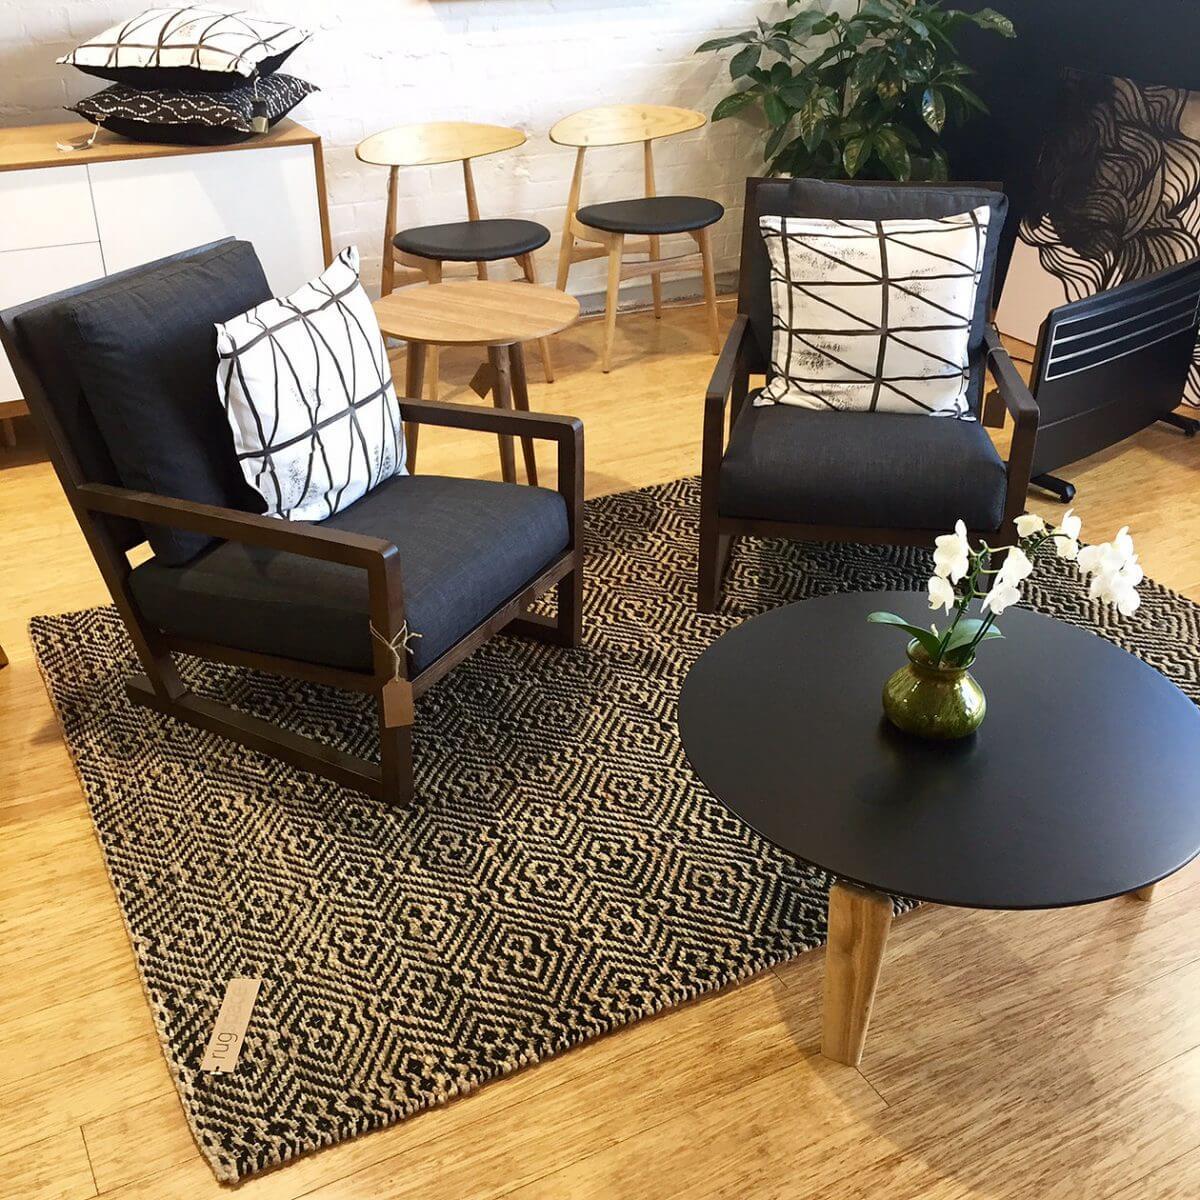 James Treble for rugspace rug wool organic texture rug silla furniture united interiors